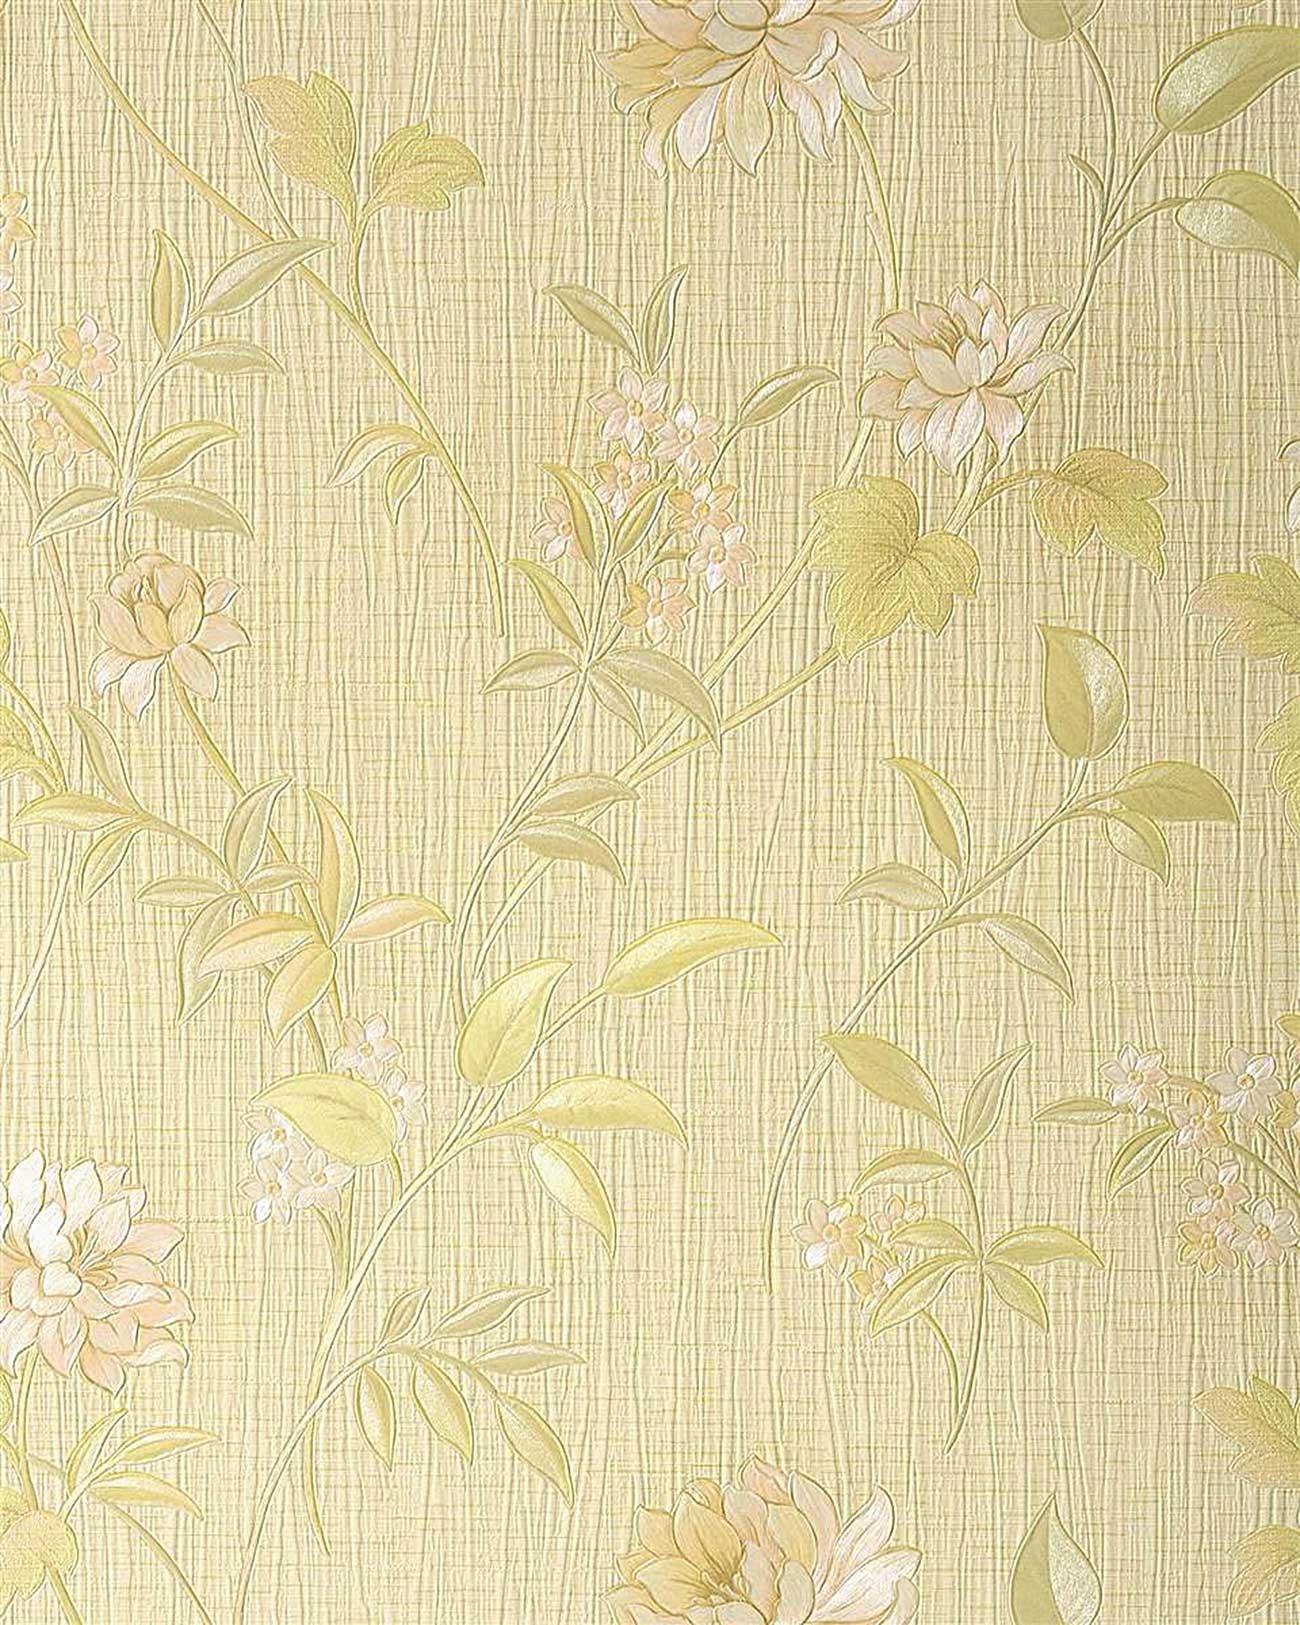 Papel pintado con dise o de flores asia y patr n floral for Tapete en ingles